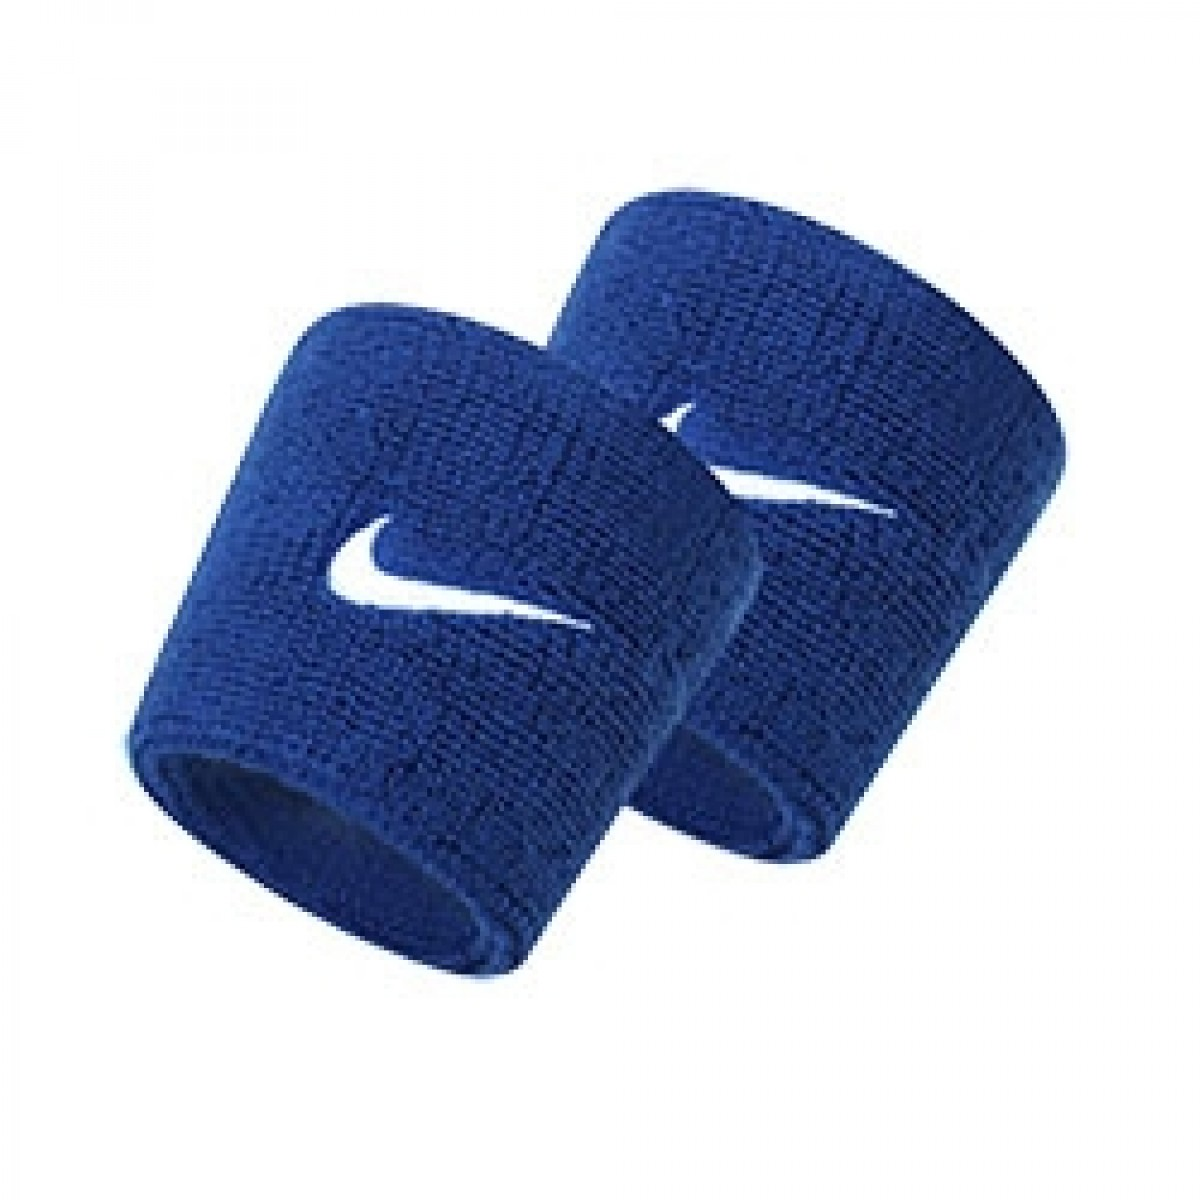 Nike Wristband 'Blue'